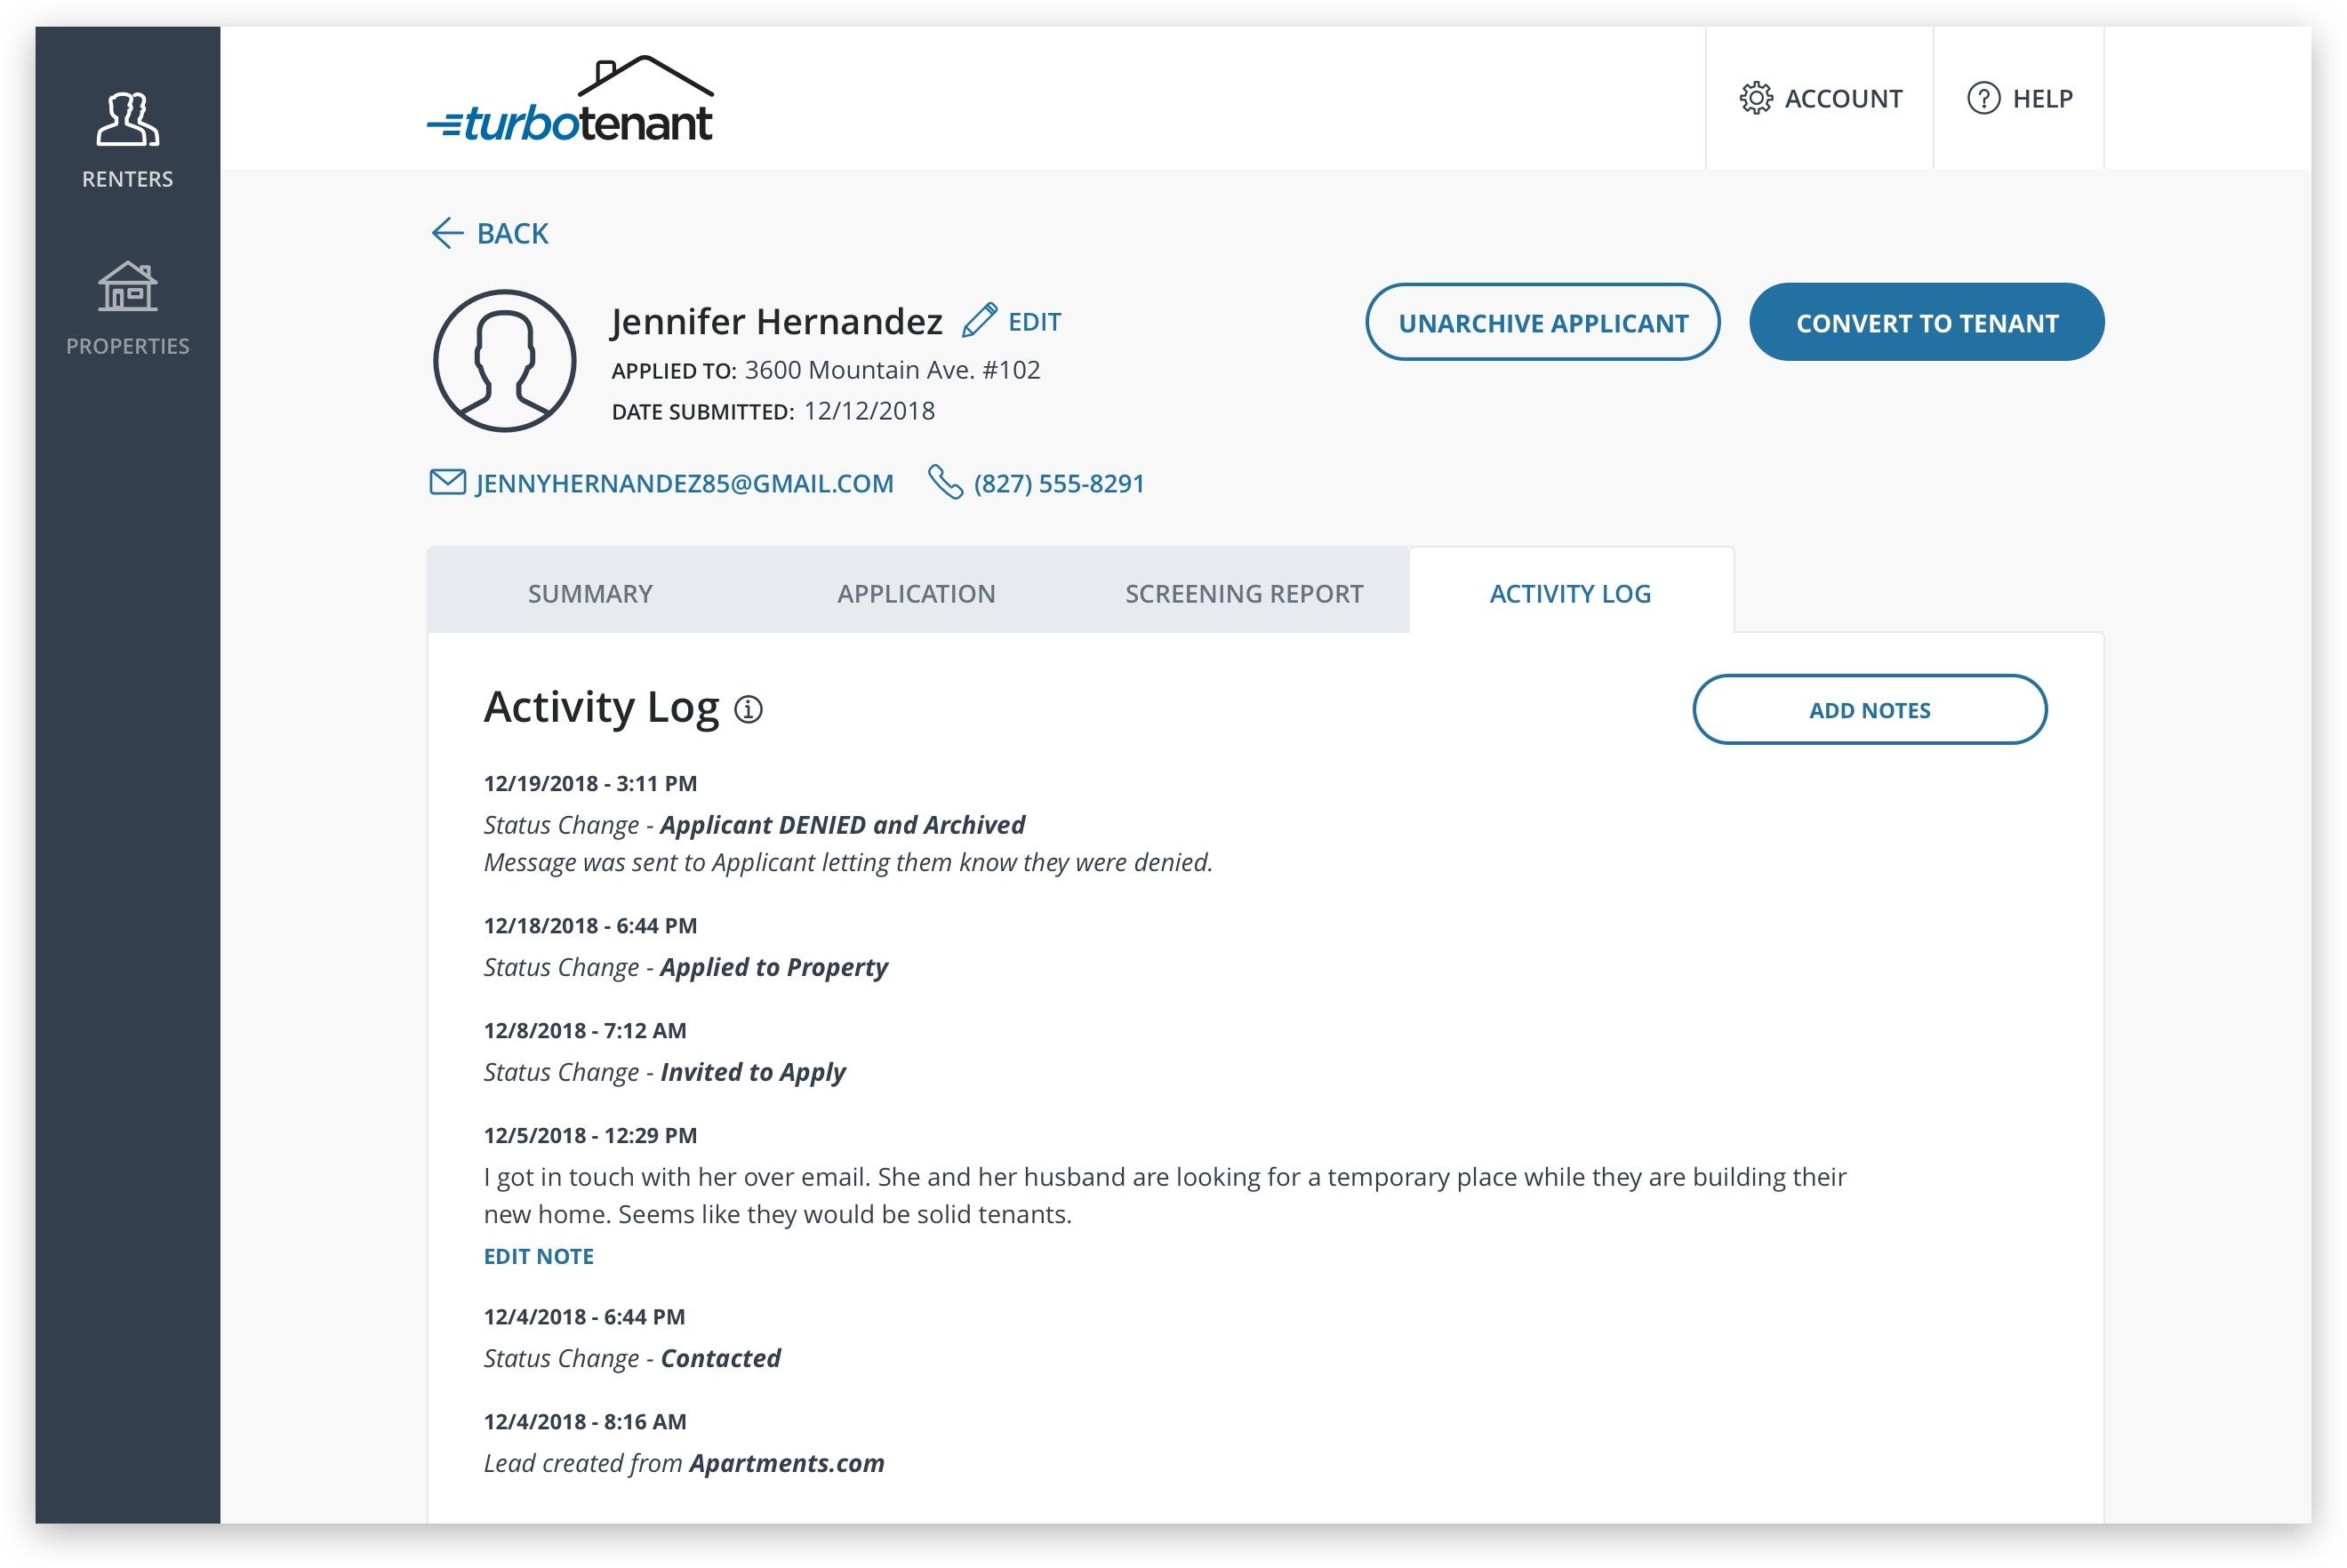 Applicant_Profile_-_Denied___Message_Sent.jpg